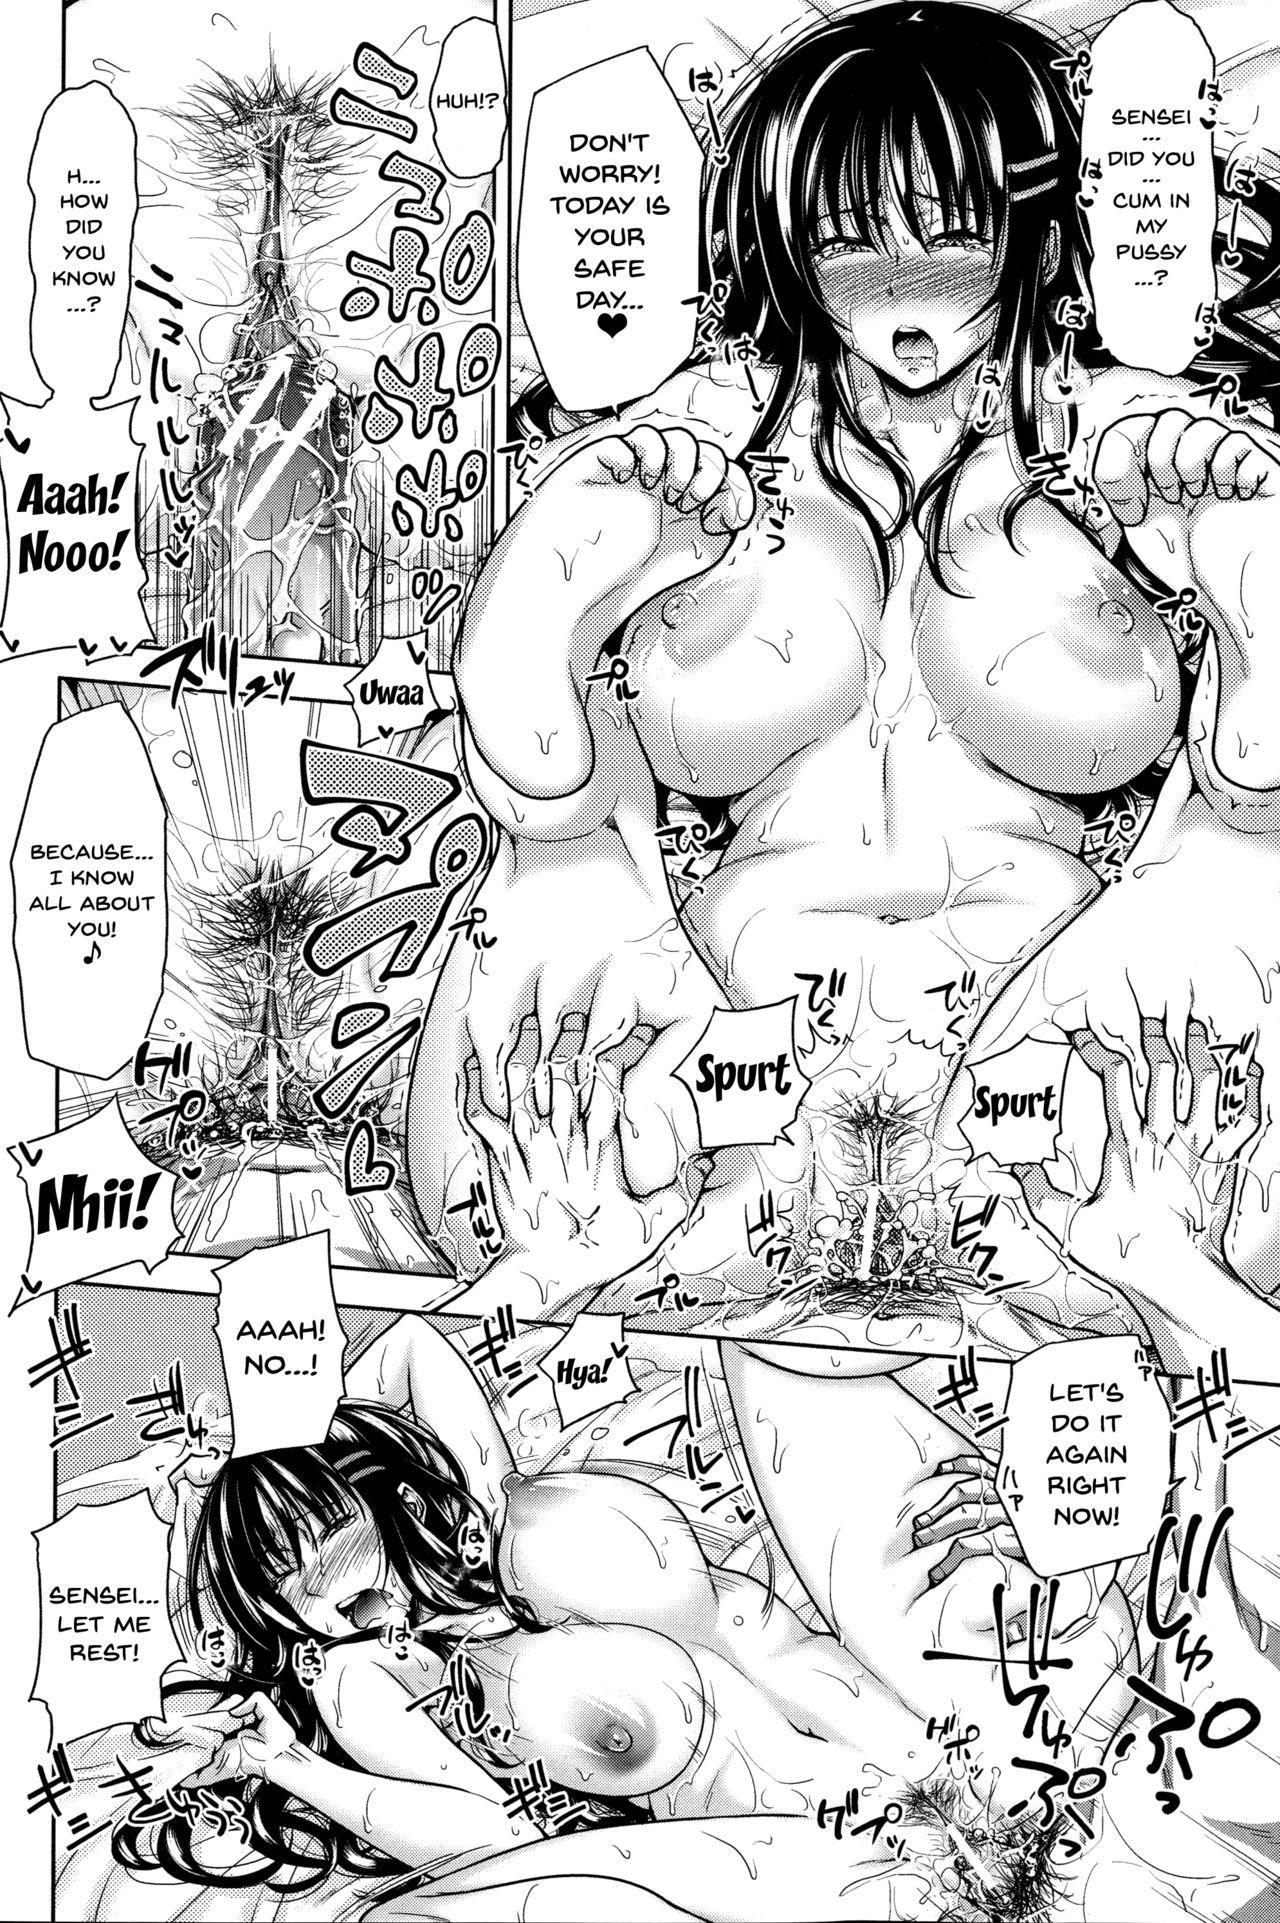 Pakotate! Seikouritsu 0% no Teppeki Bishojo VS Seikouritsu 100% no Hentai Katei Kyoushi   Pakotate! Sex Rate 0% Iron-Willed Beautiful Virgins VS Sex Rate 100% Perverted Coach 157